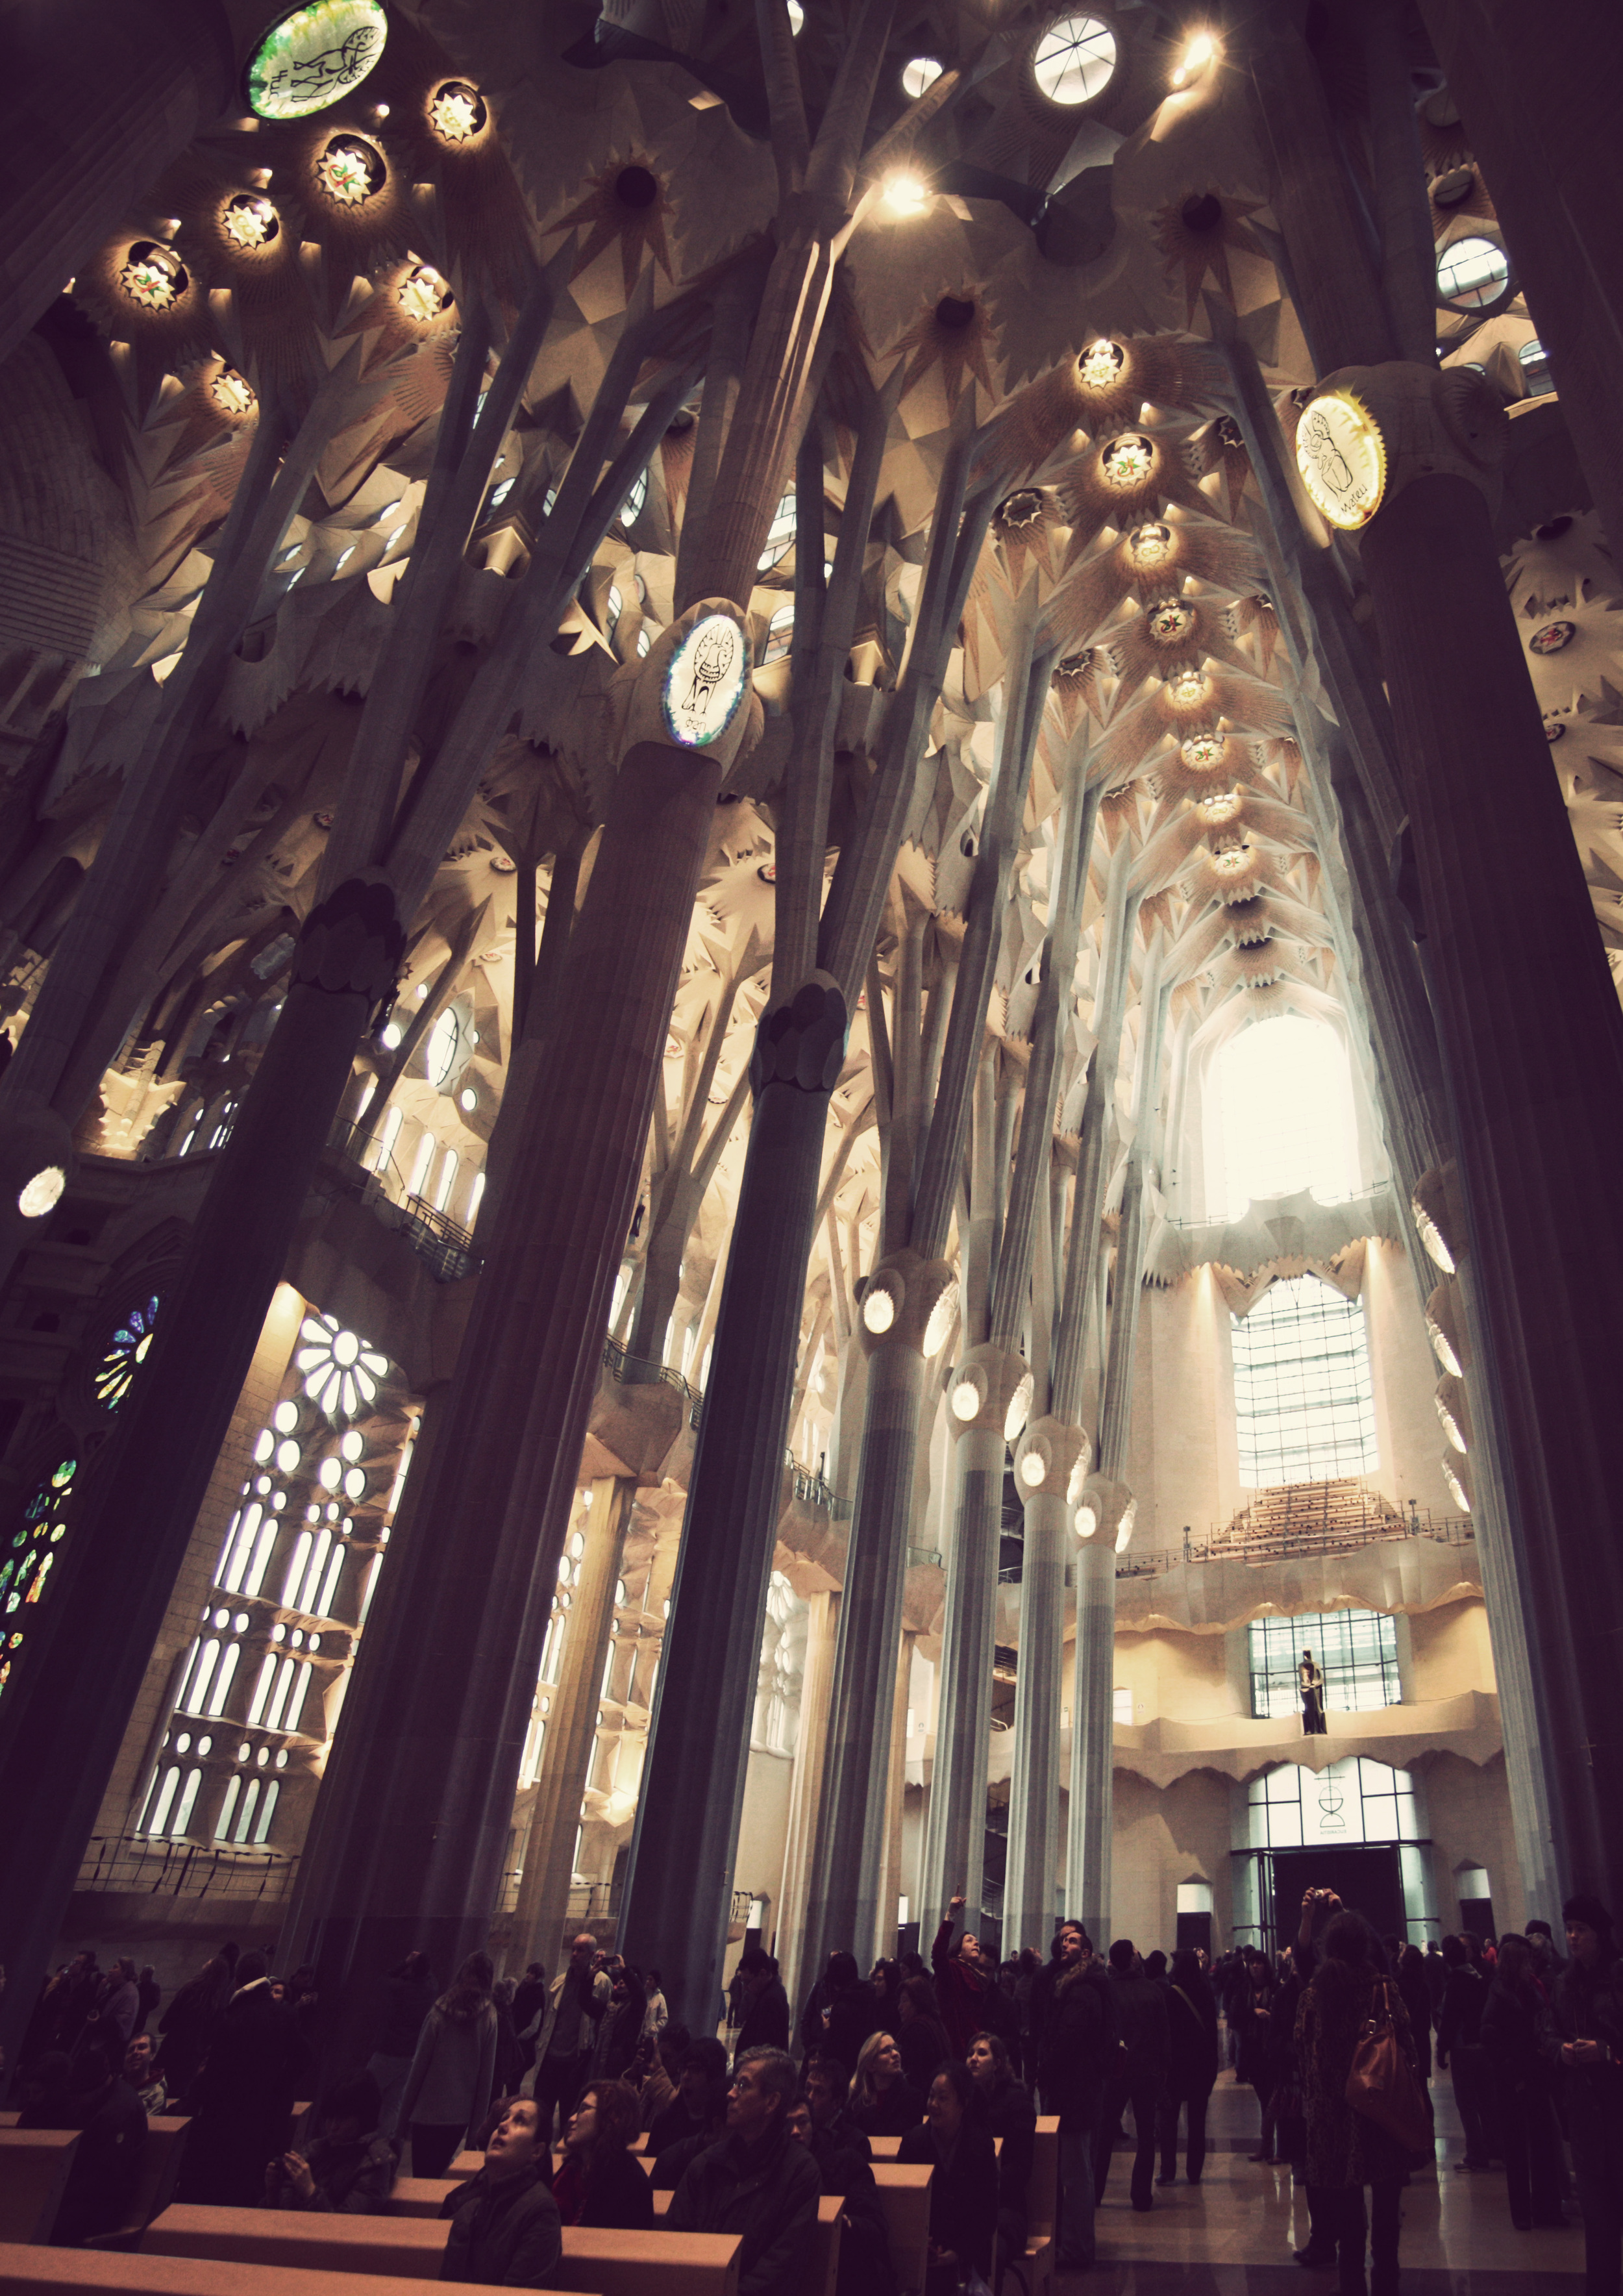 BCN_Sagrada Familia_03.jpg